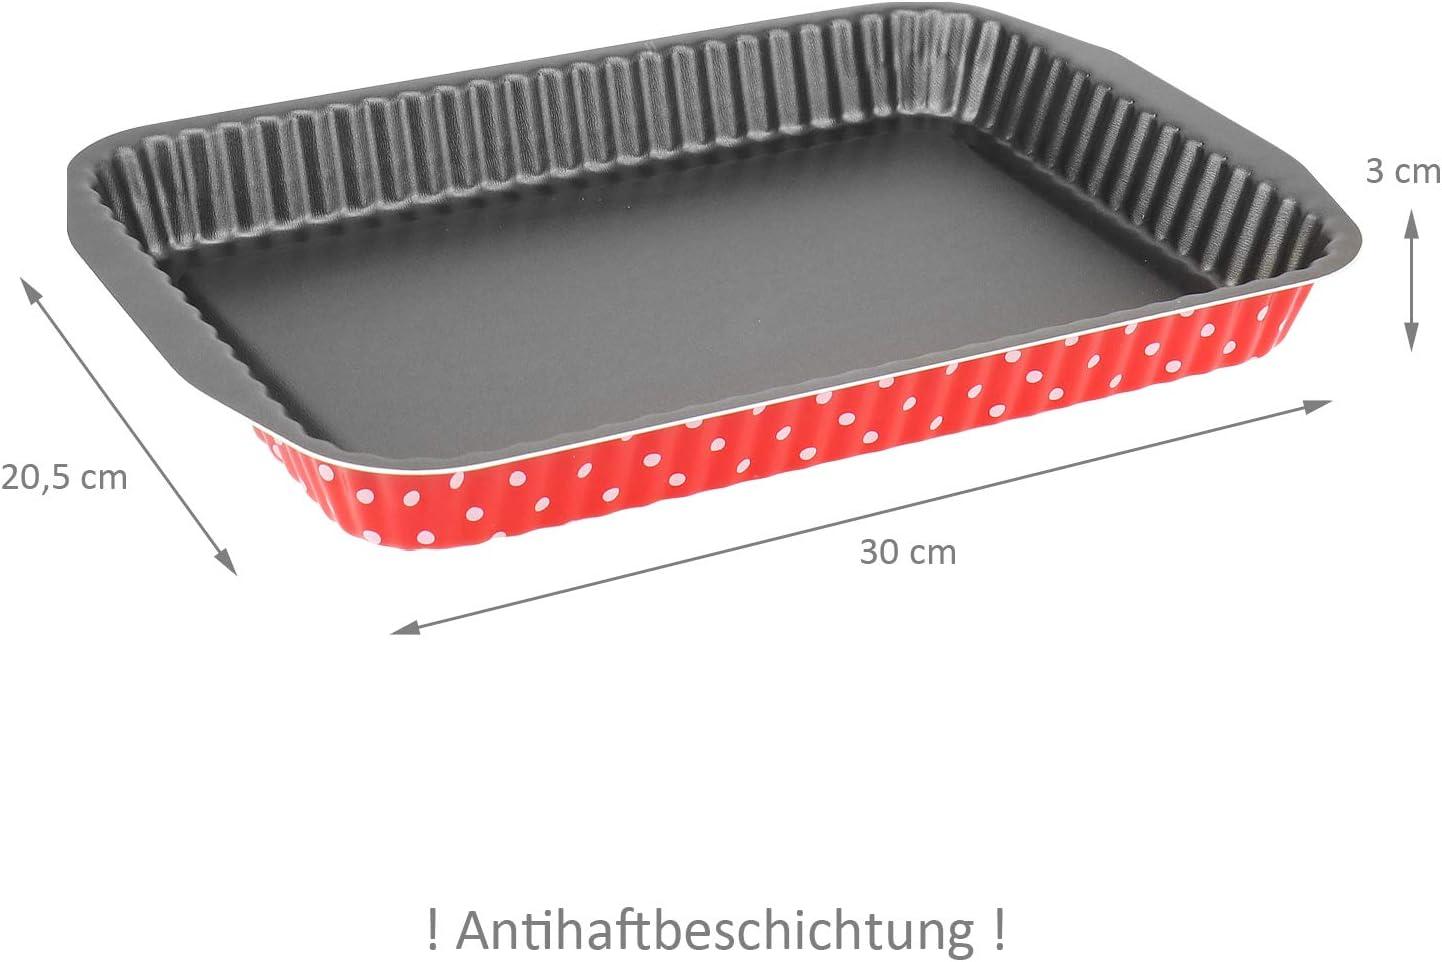 WELLGRO Backformen Set 3-tlg - Backform rund Antihaftbeschichtung Tarteform /& Backform eckig Rot gepunktet